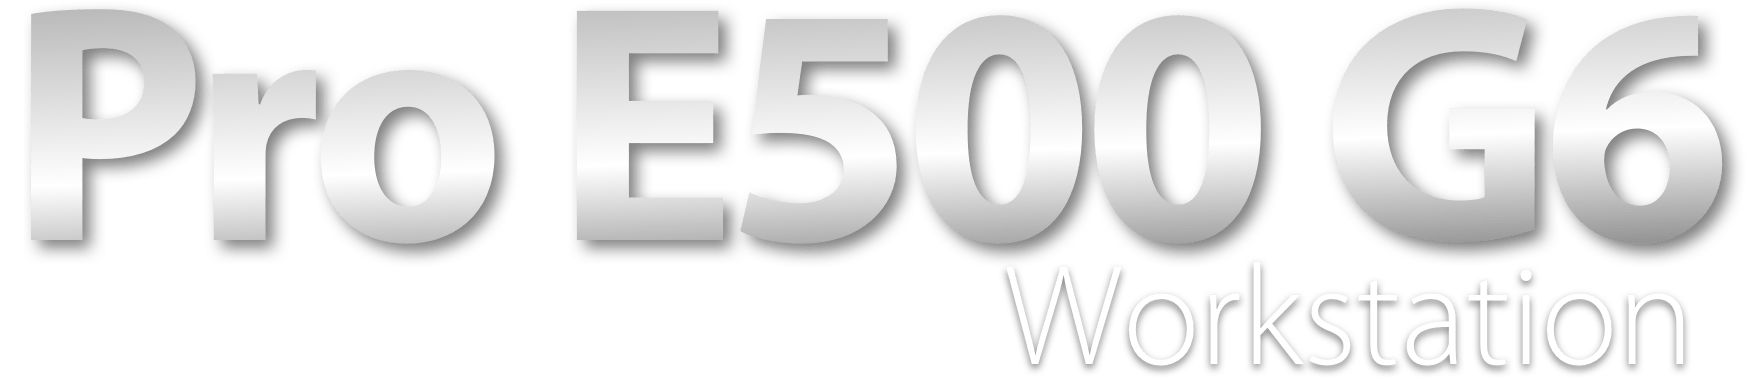 Pro E500 G6 Workstation